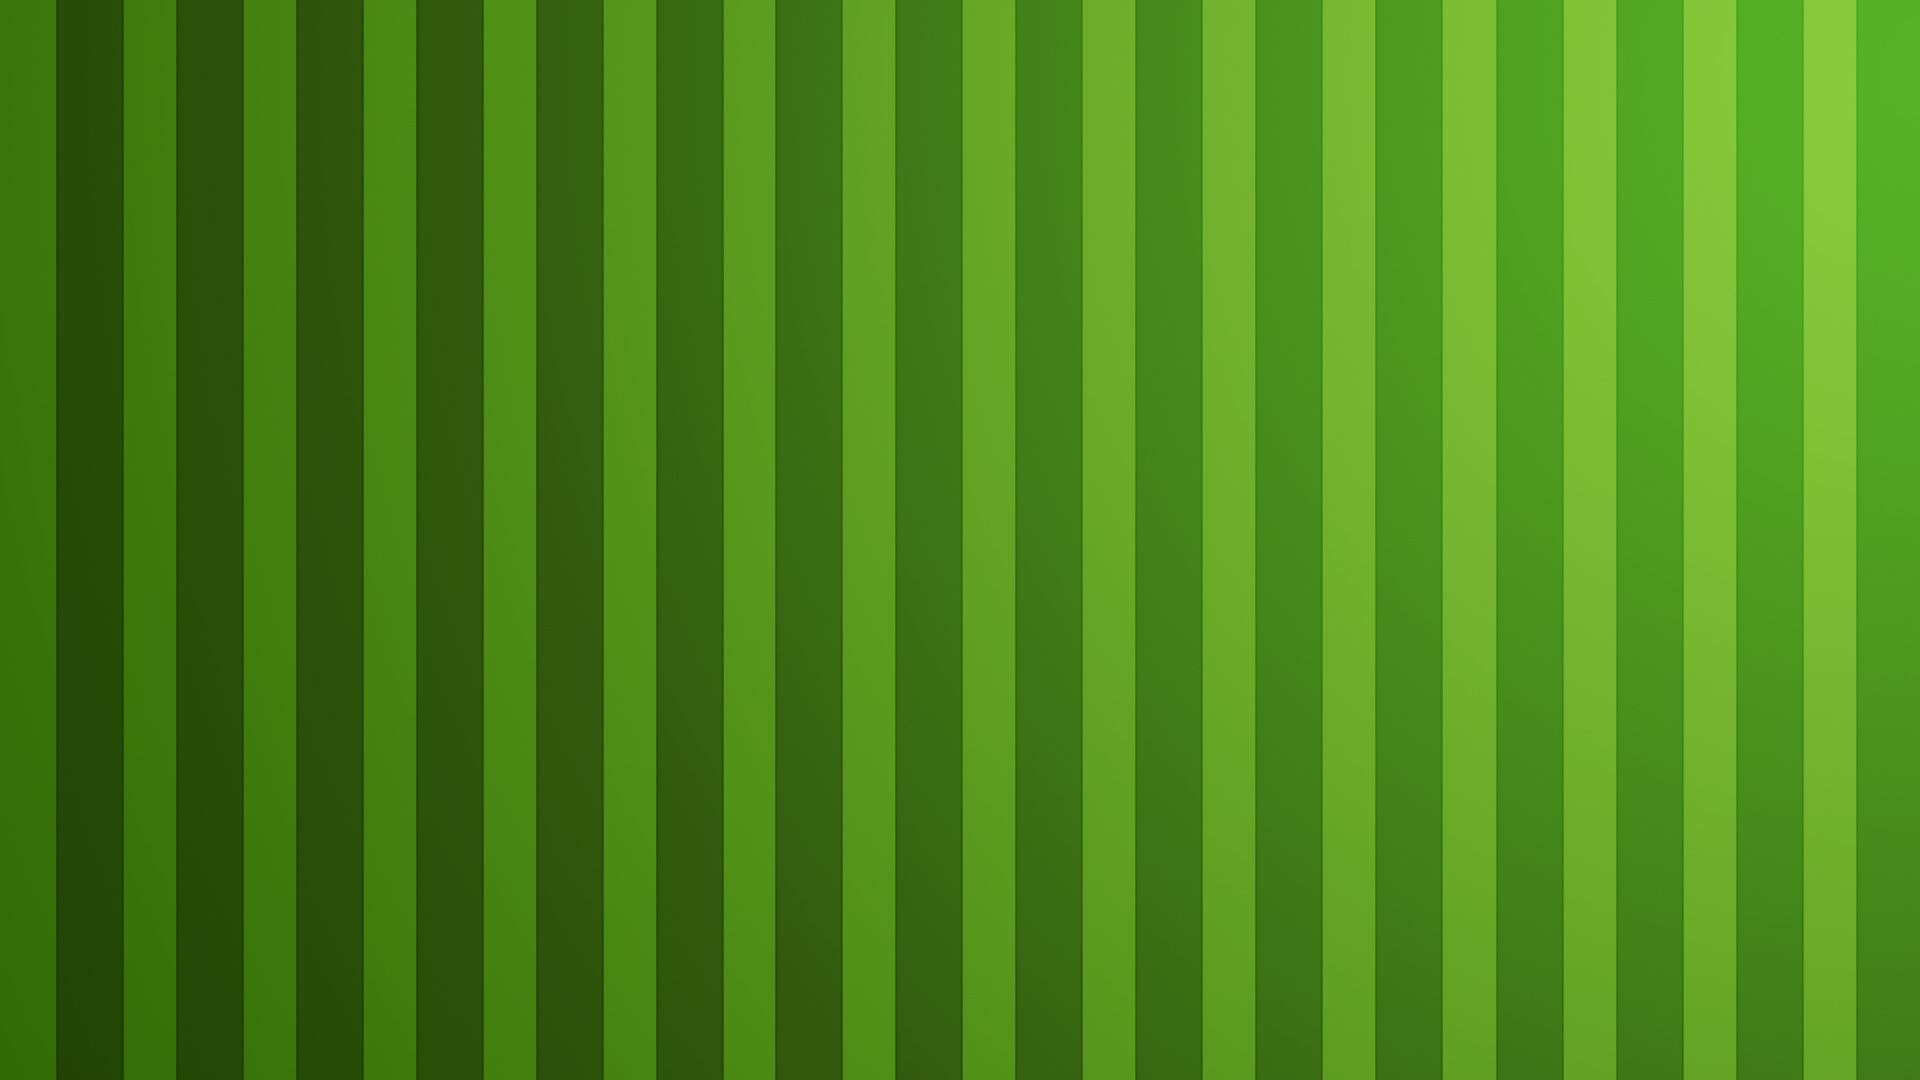 Free Inspirational Quotes Wallpaper Green Wallpapers Hd Pixelstalk Net